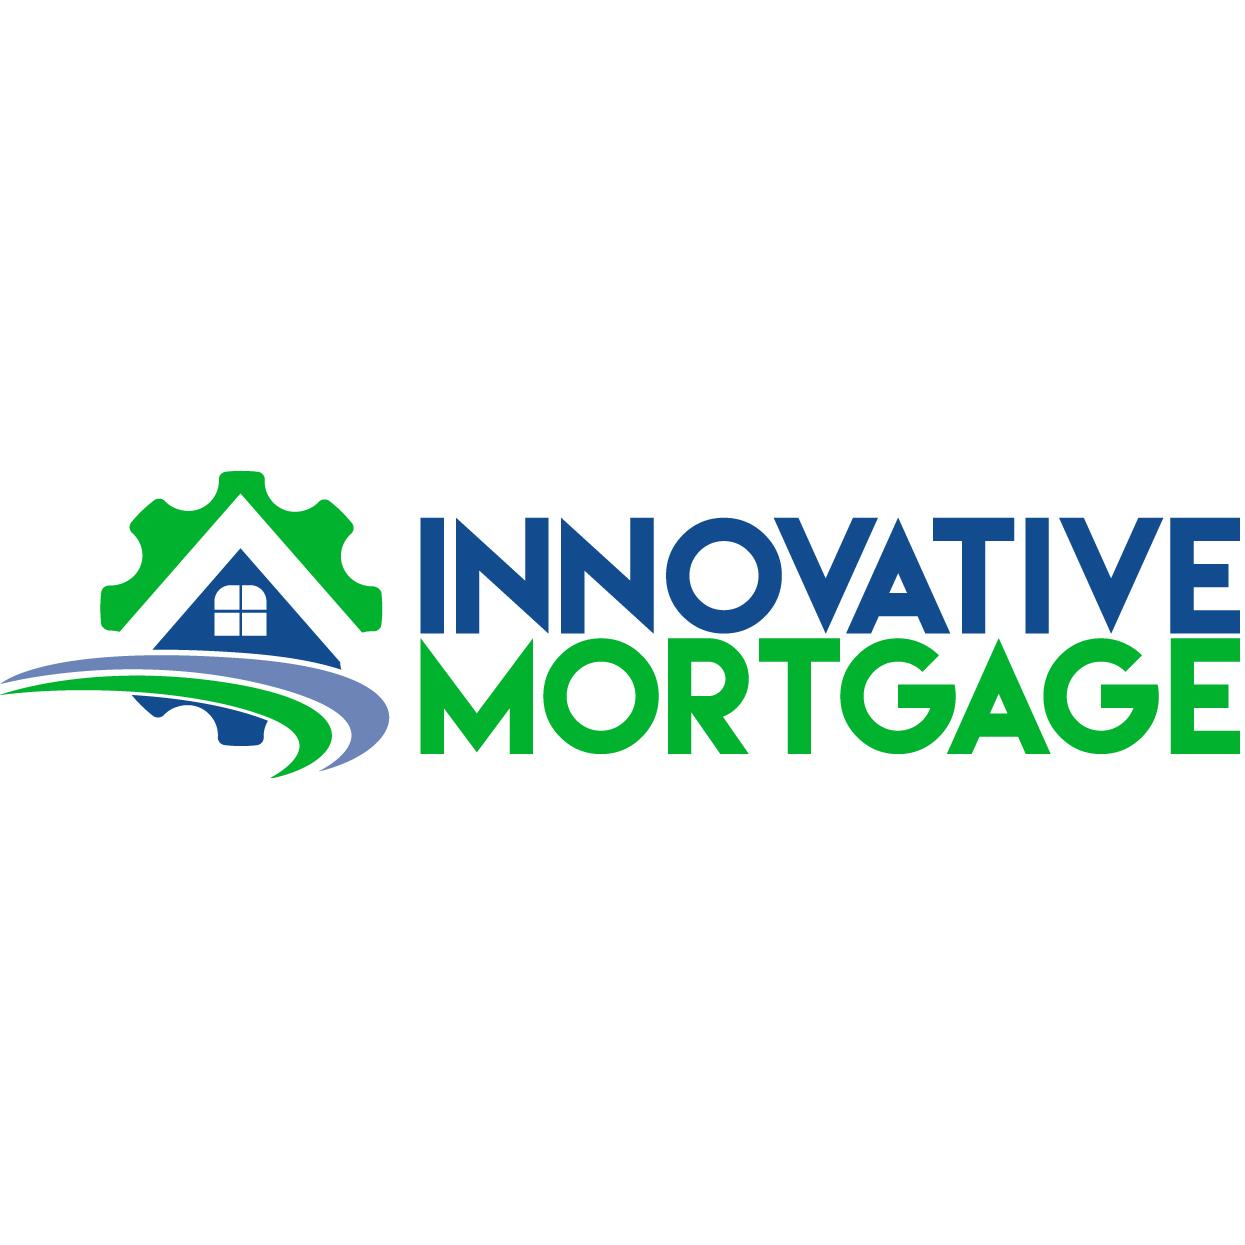 RJ Hanke - Innovative Mortgage Services